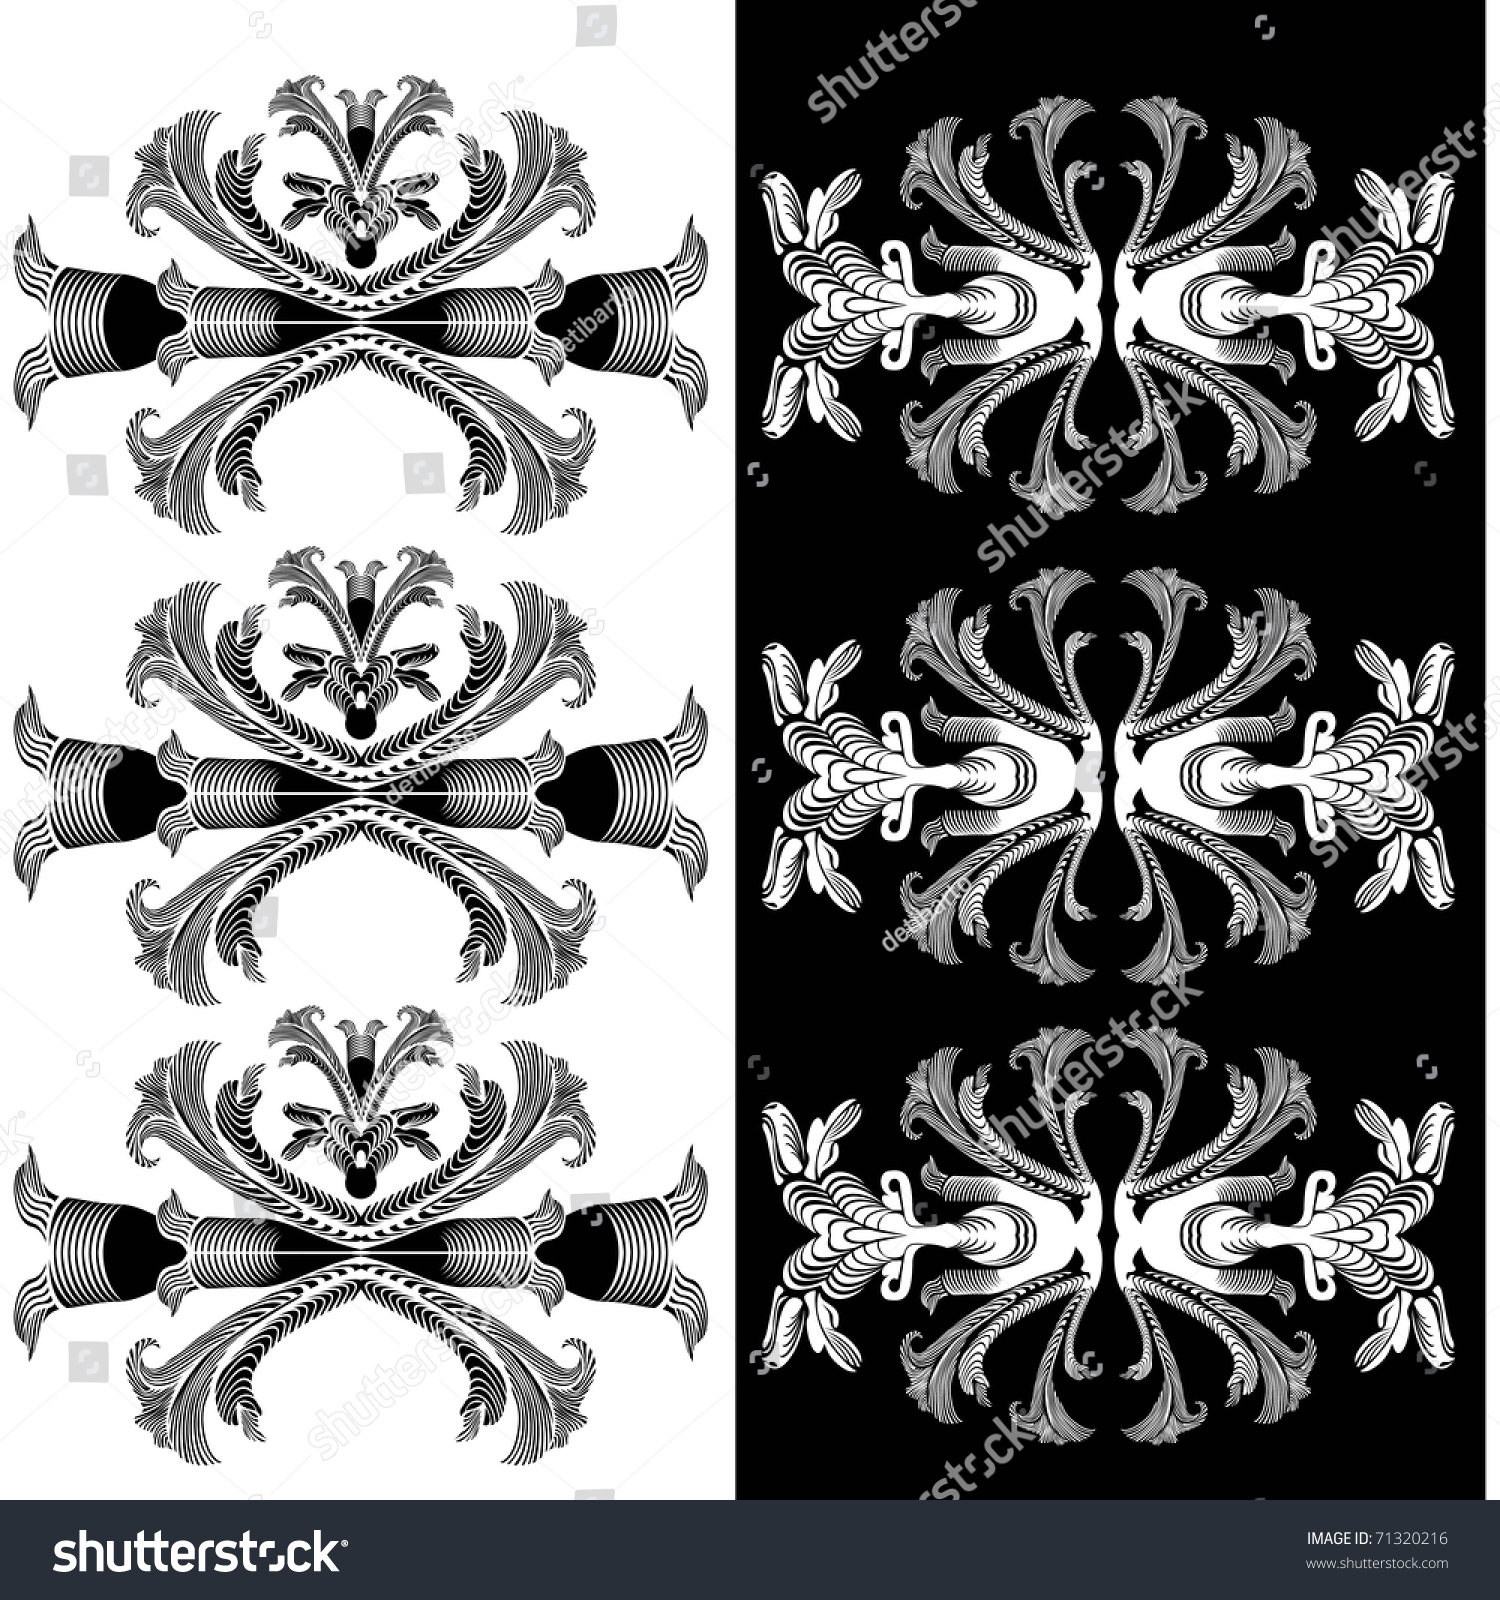 Vector Illustration Pattern Rococo Baroque Styles Stock